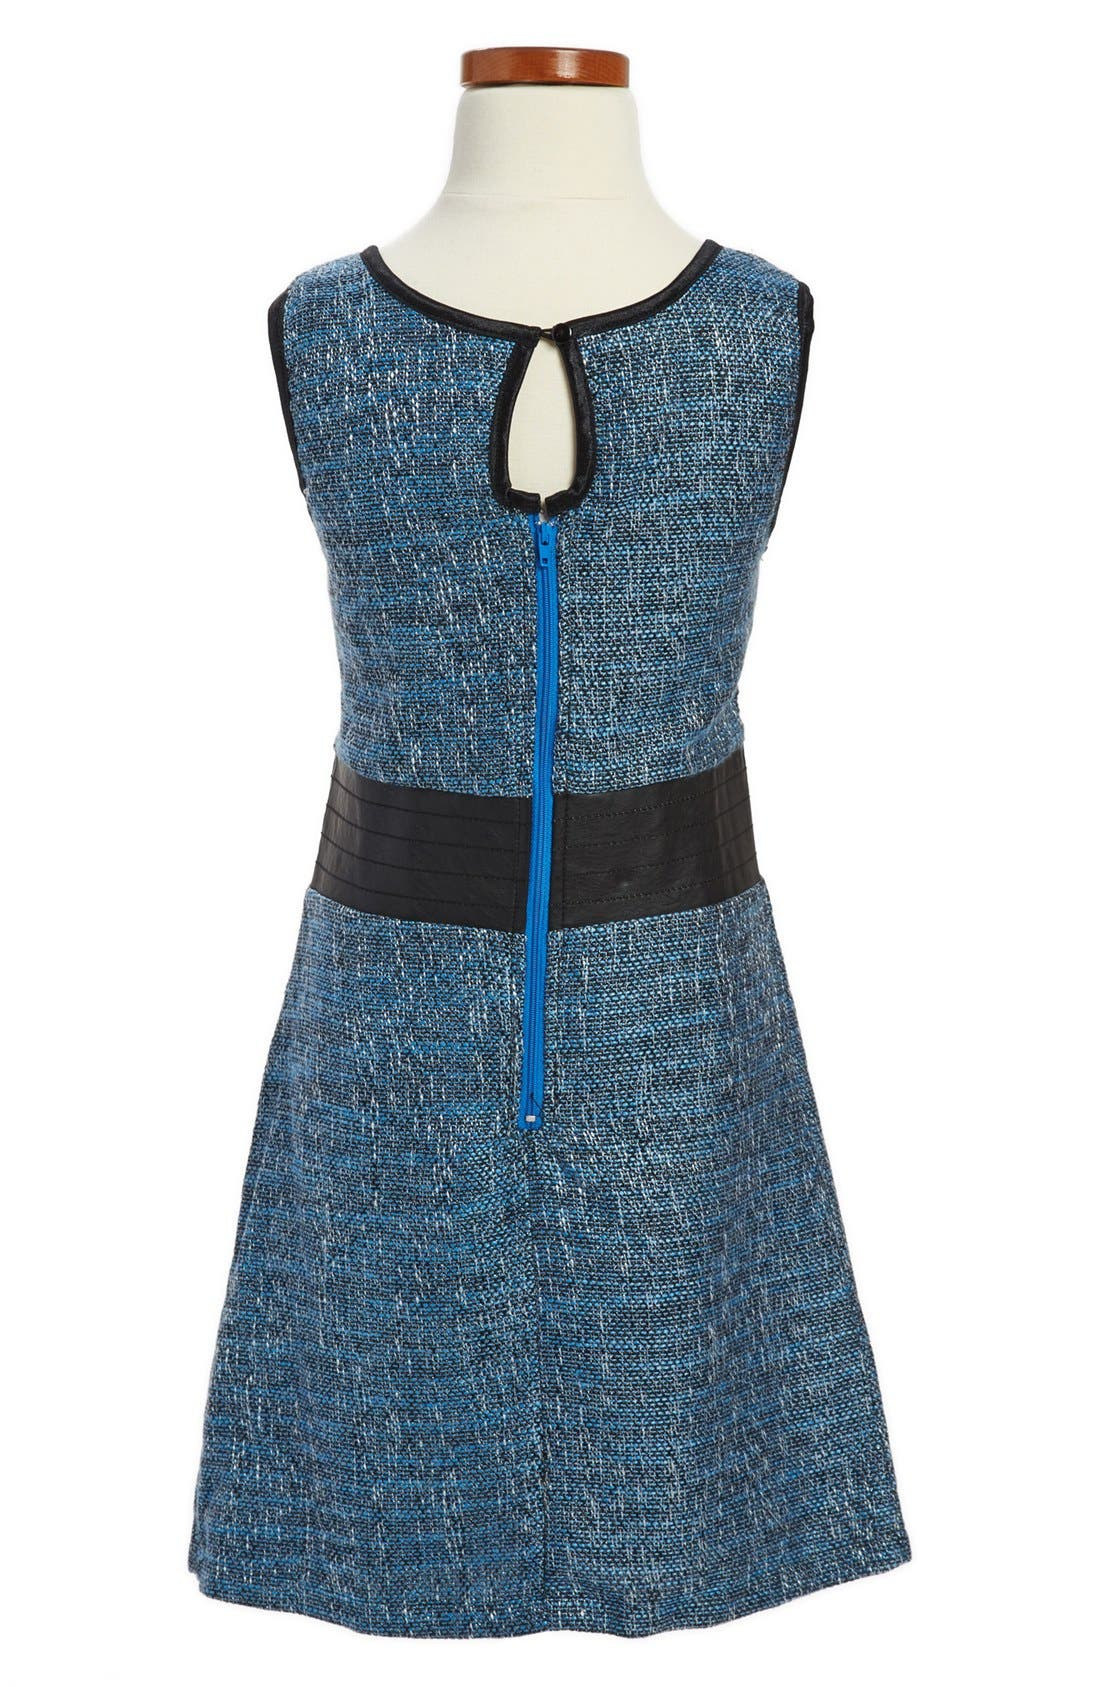 Alternate Image 2  - Laundry by Shelli Segal 'Gemma' Tweed Dress (Big Girls)